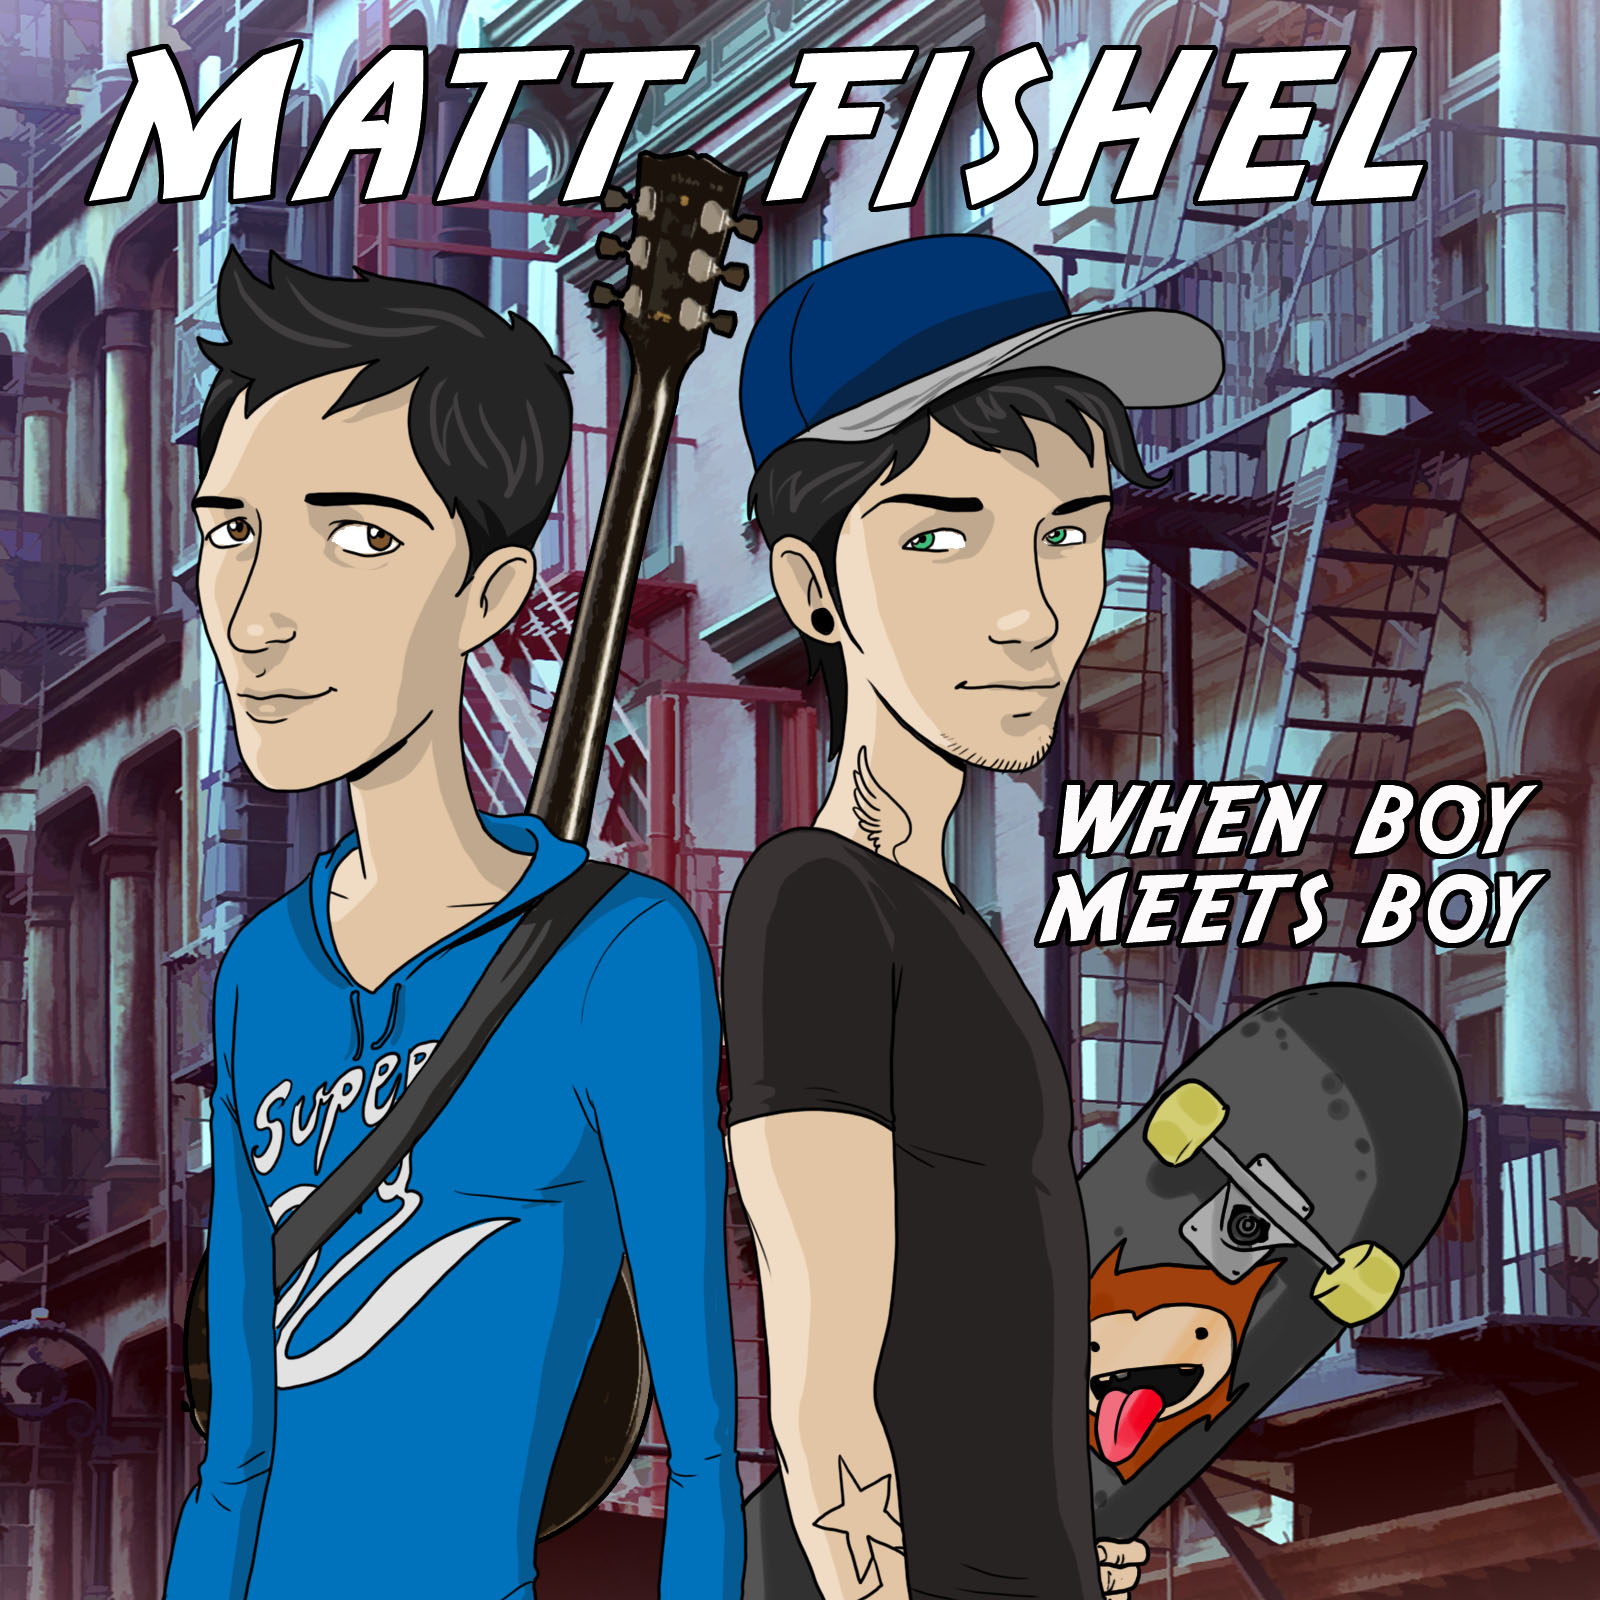 Matt_Fishel_When_Boy_Meets_Boy_Single_Art.jpg